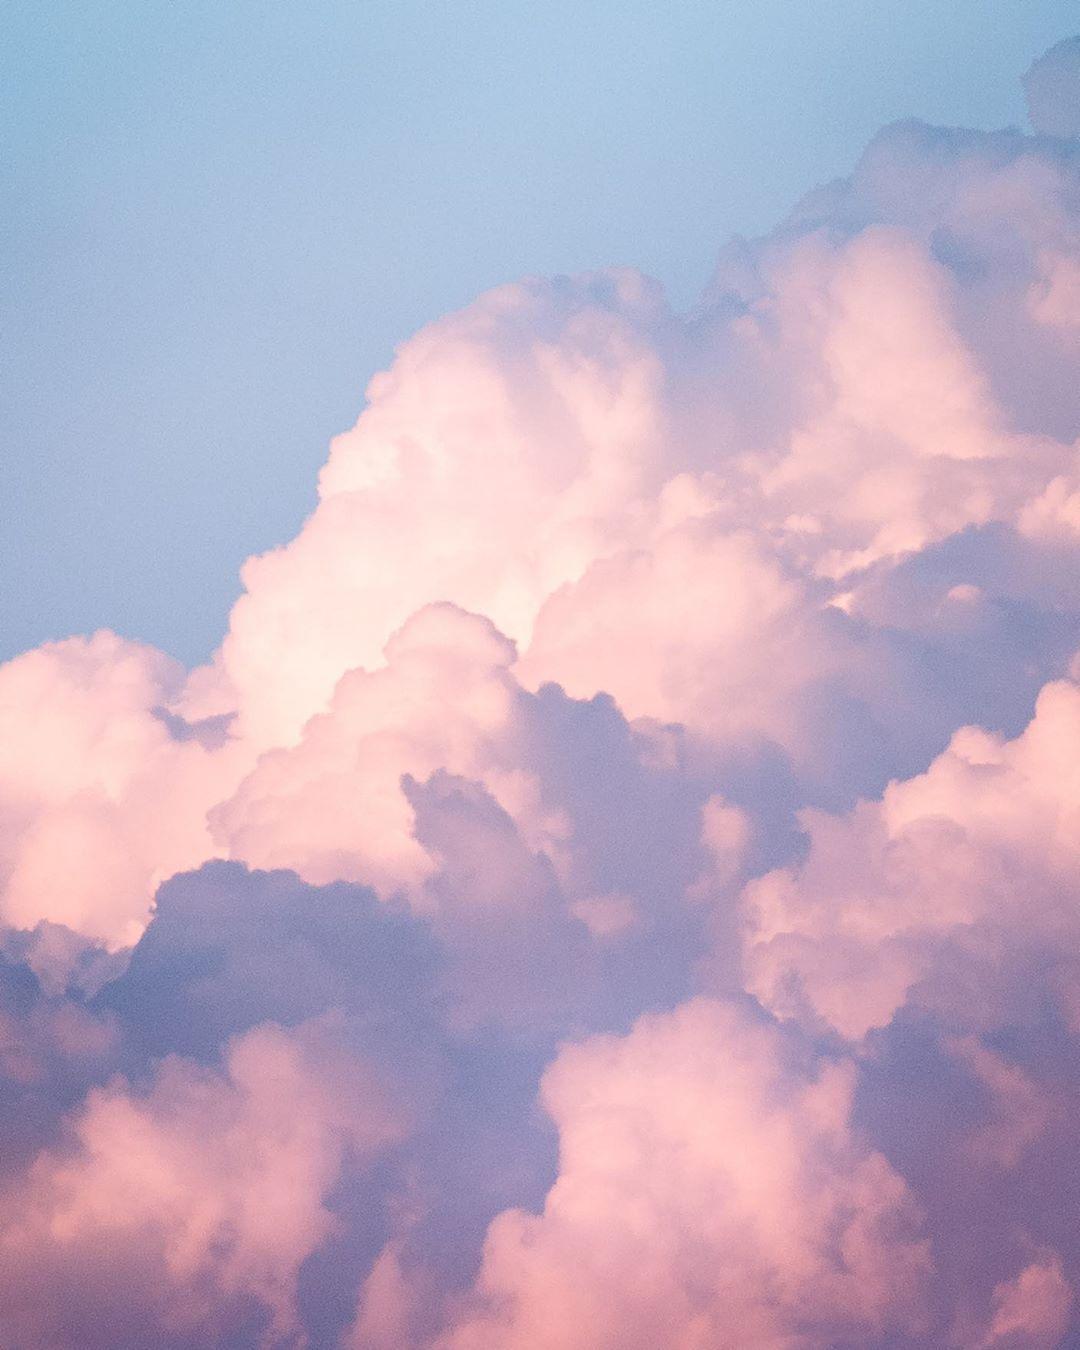 pastel sunset sky pastel sunset sky aesthetic sky painting pastel sunset sky aesthetic sky painting